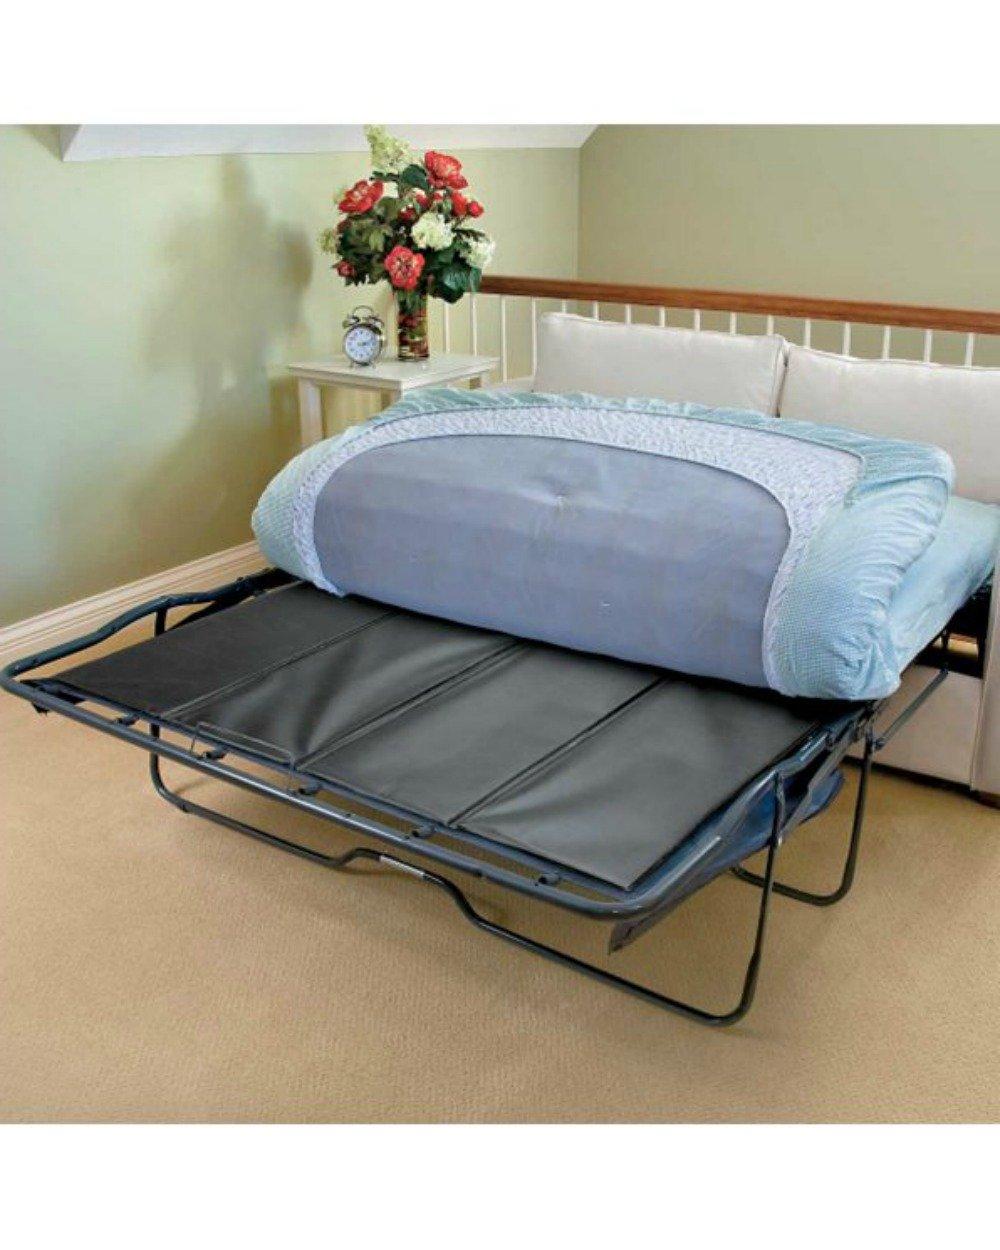 Sleeper Sofa Bed Bar Shield Queen Size Improvements